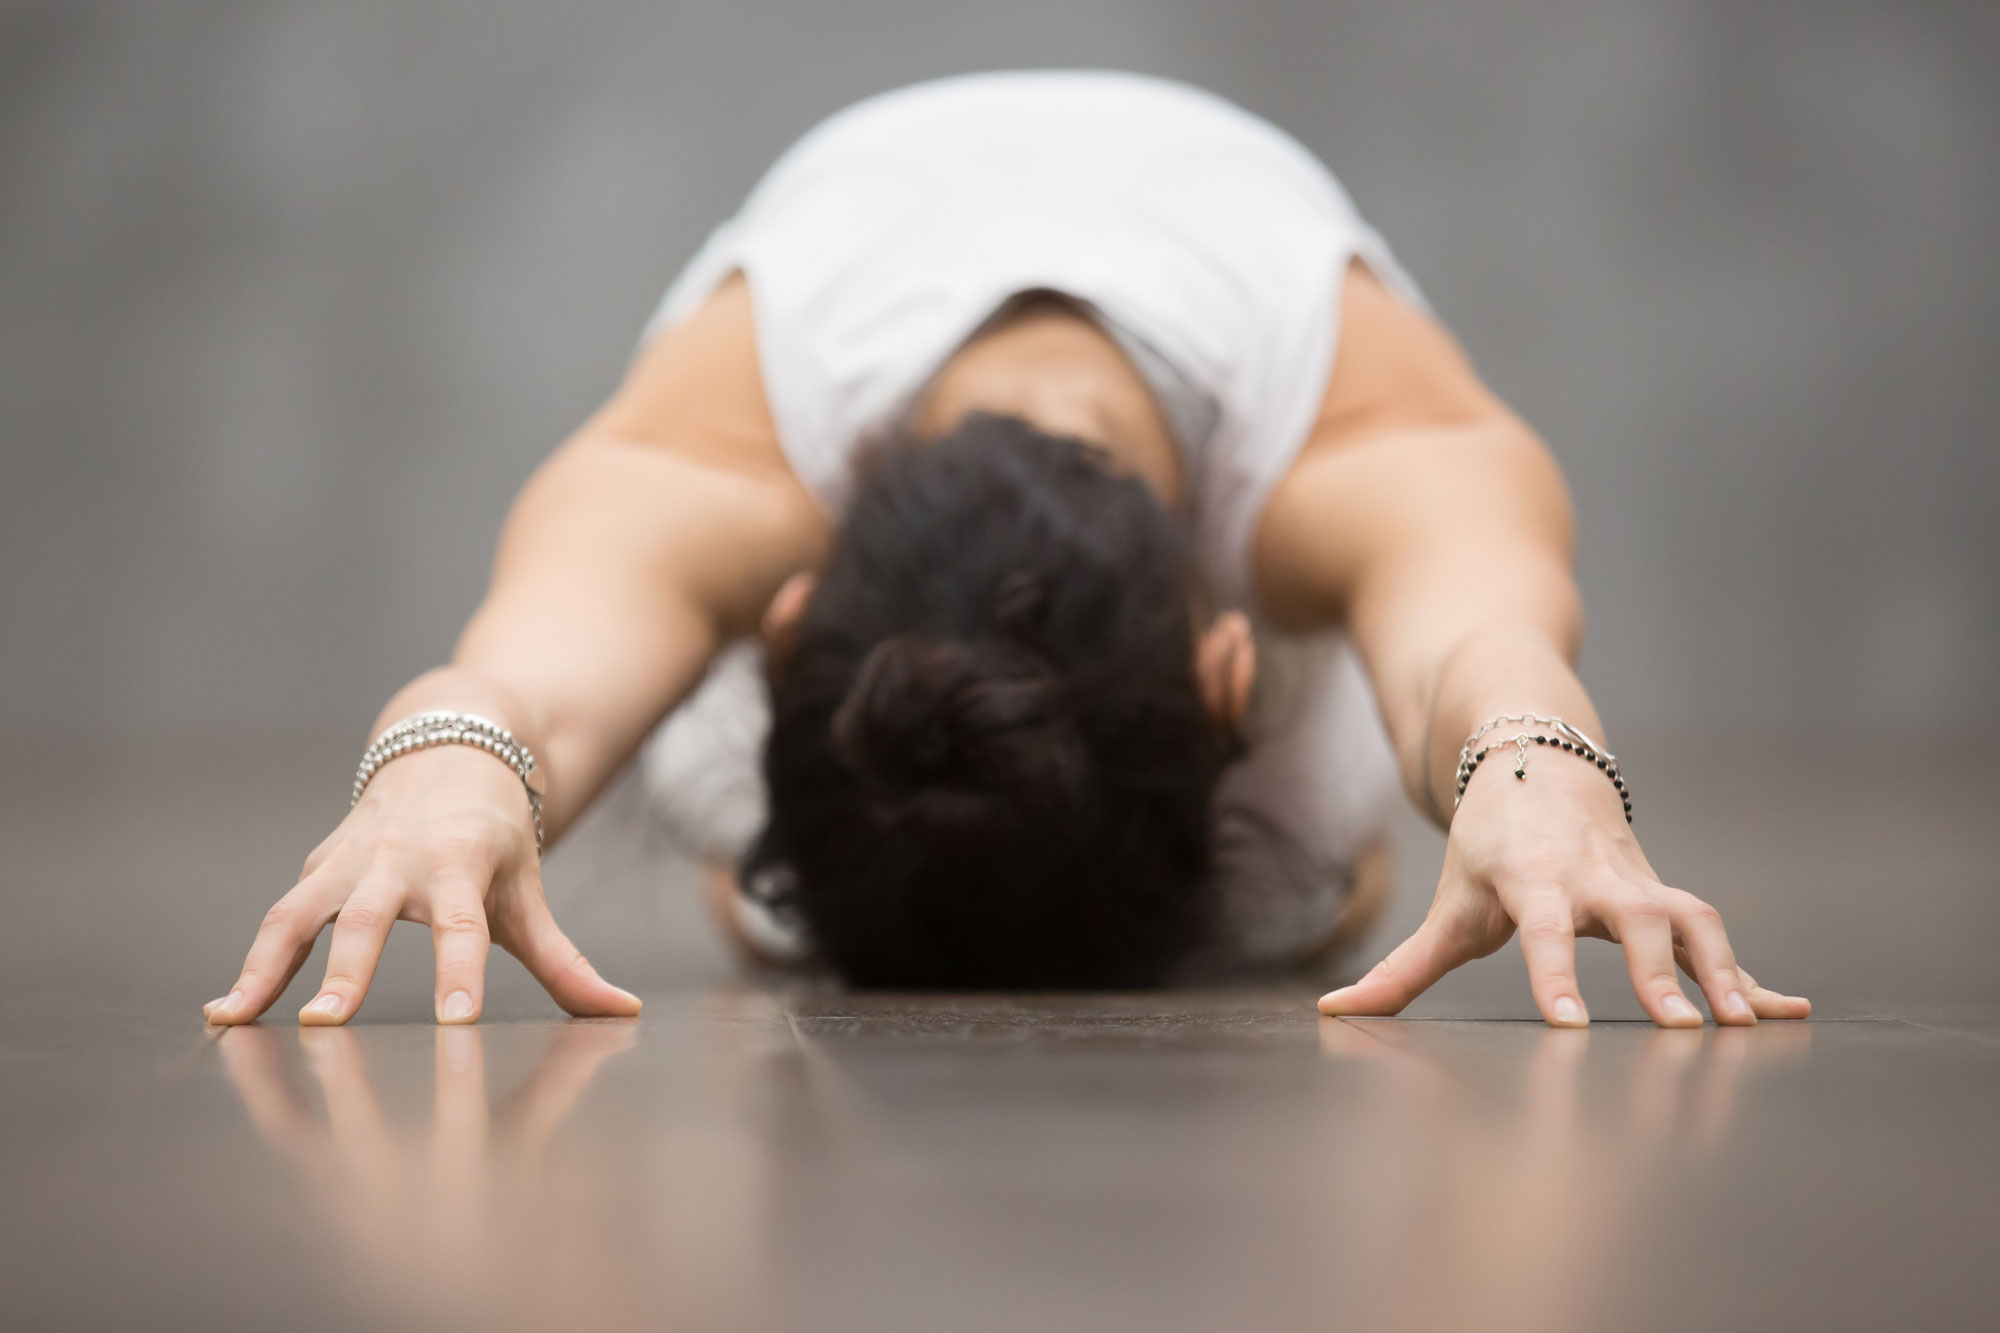 Wie übt man Yoga richtig?